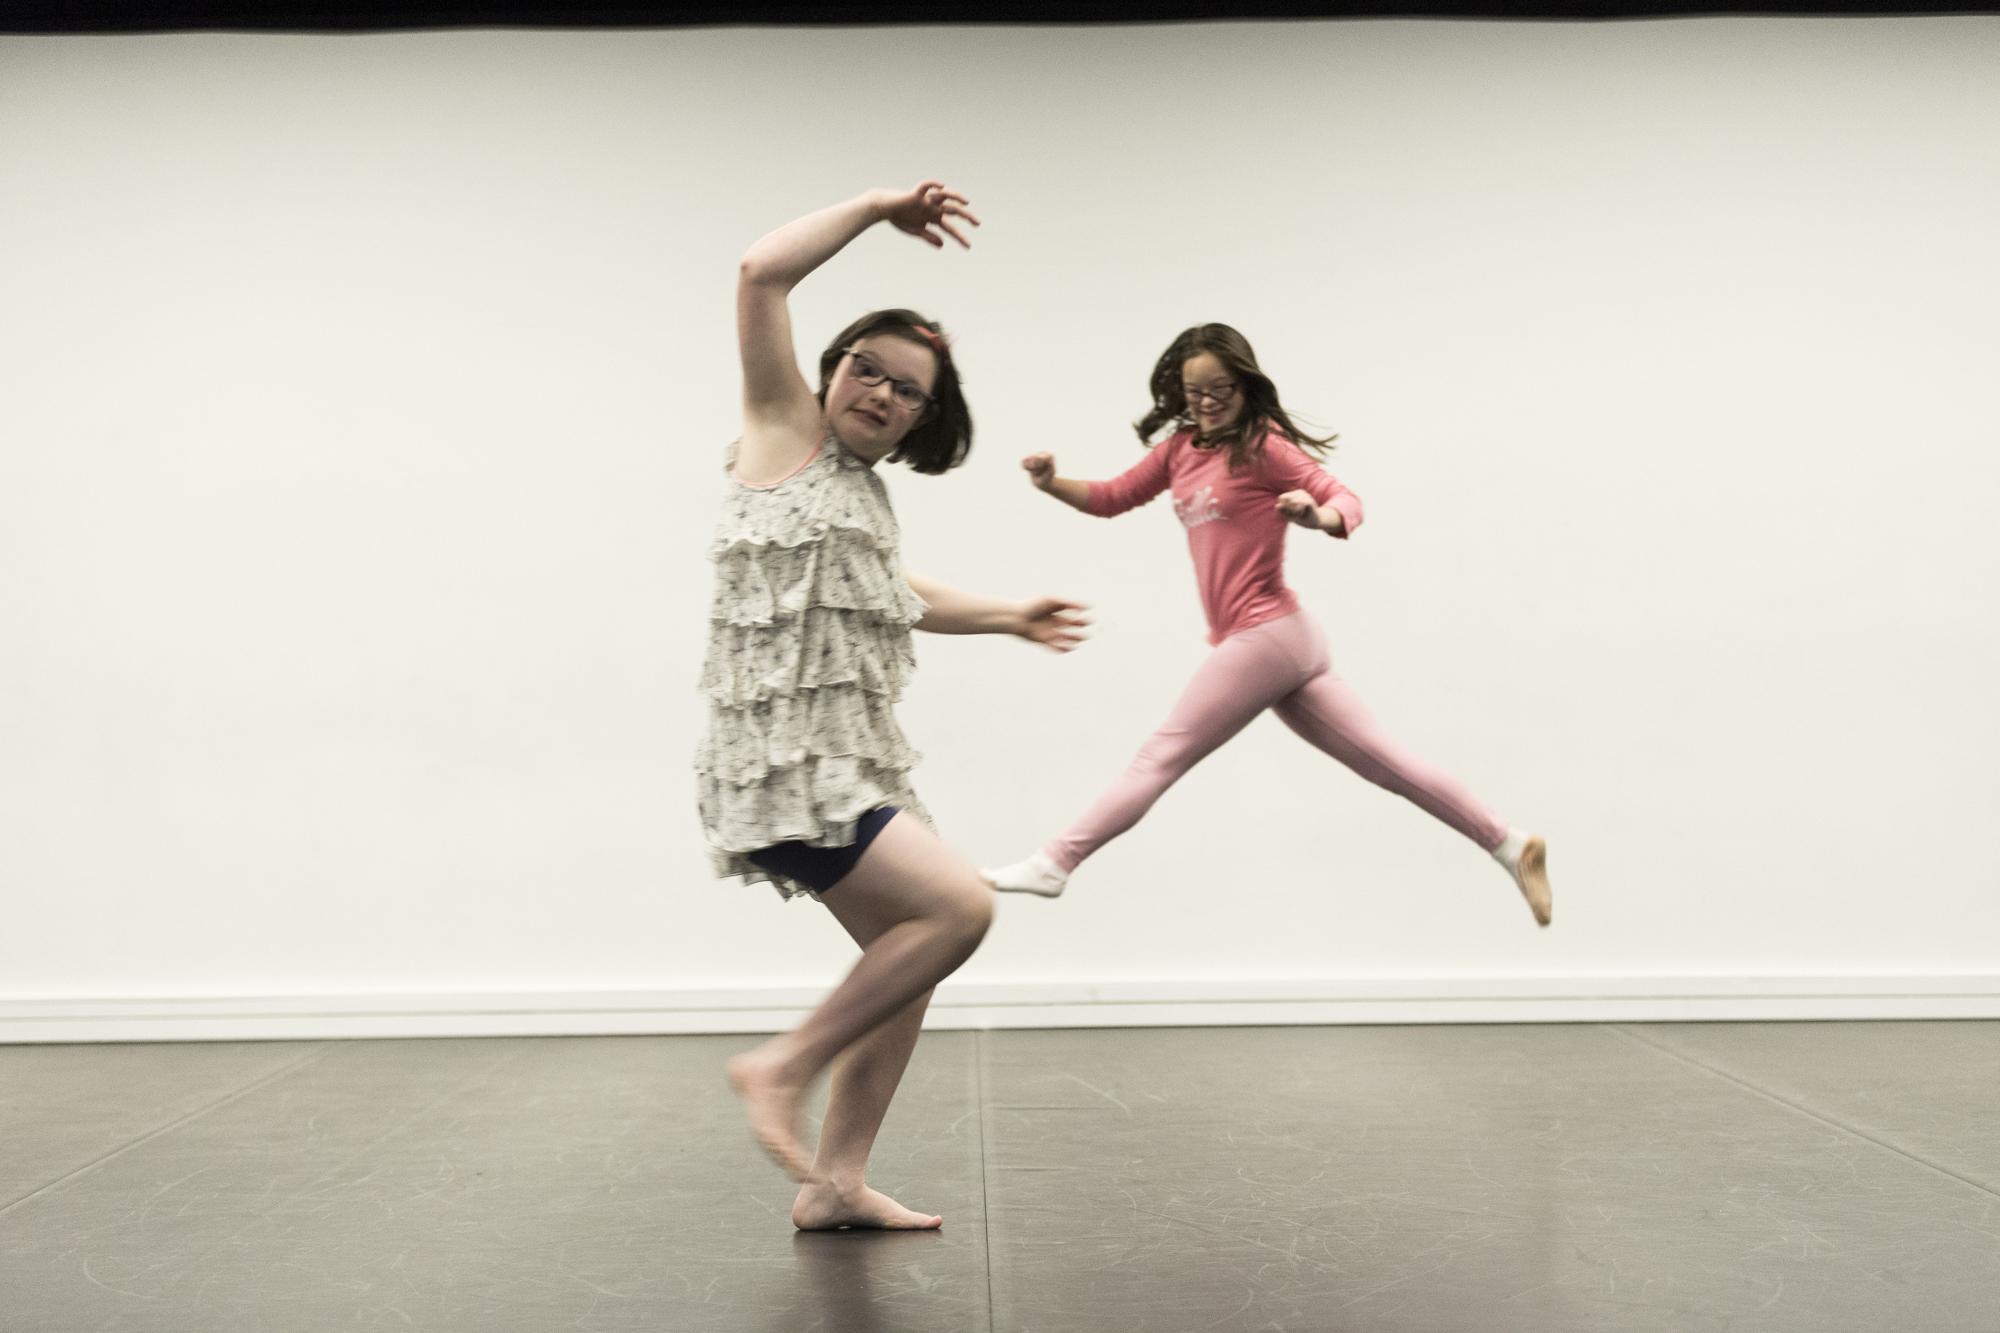 Two dancing kids